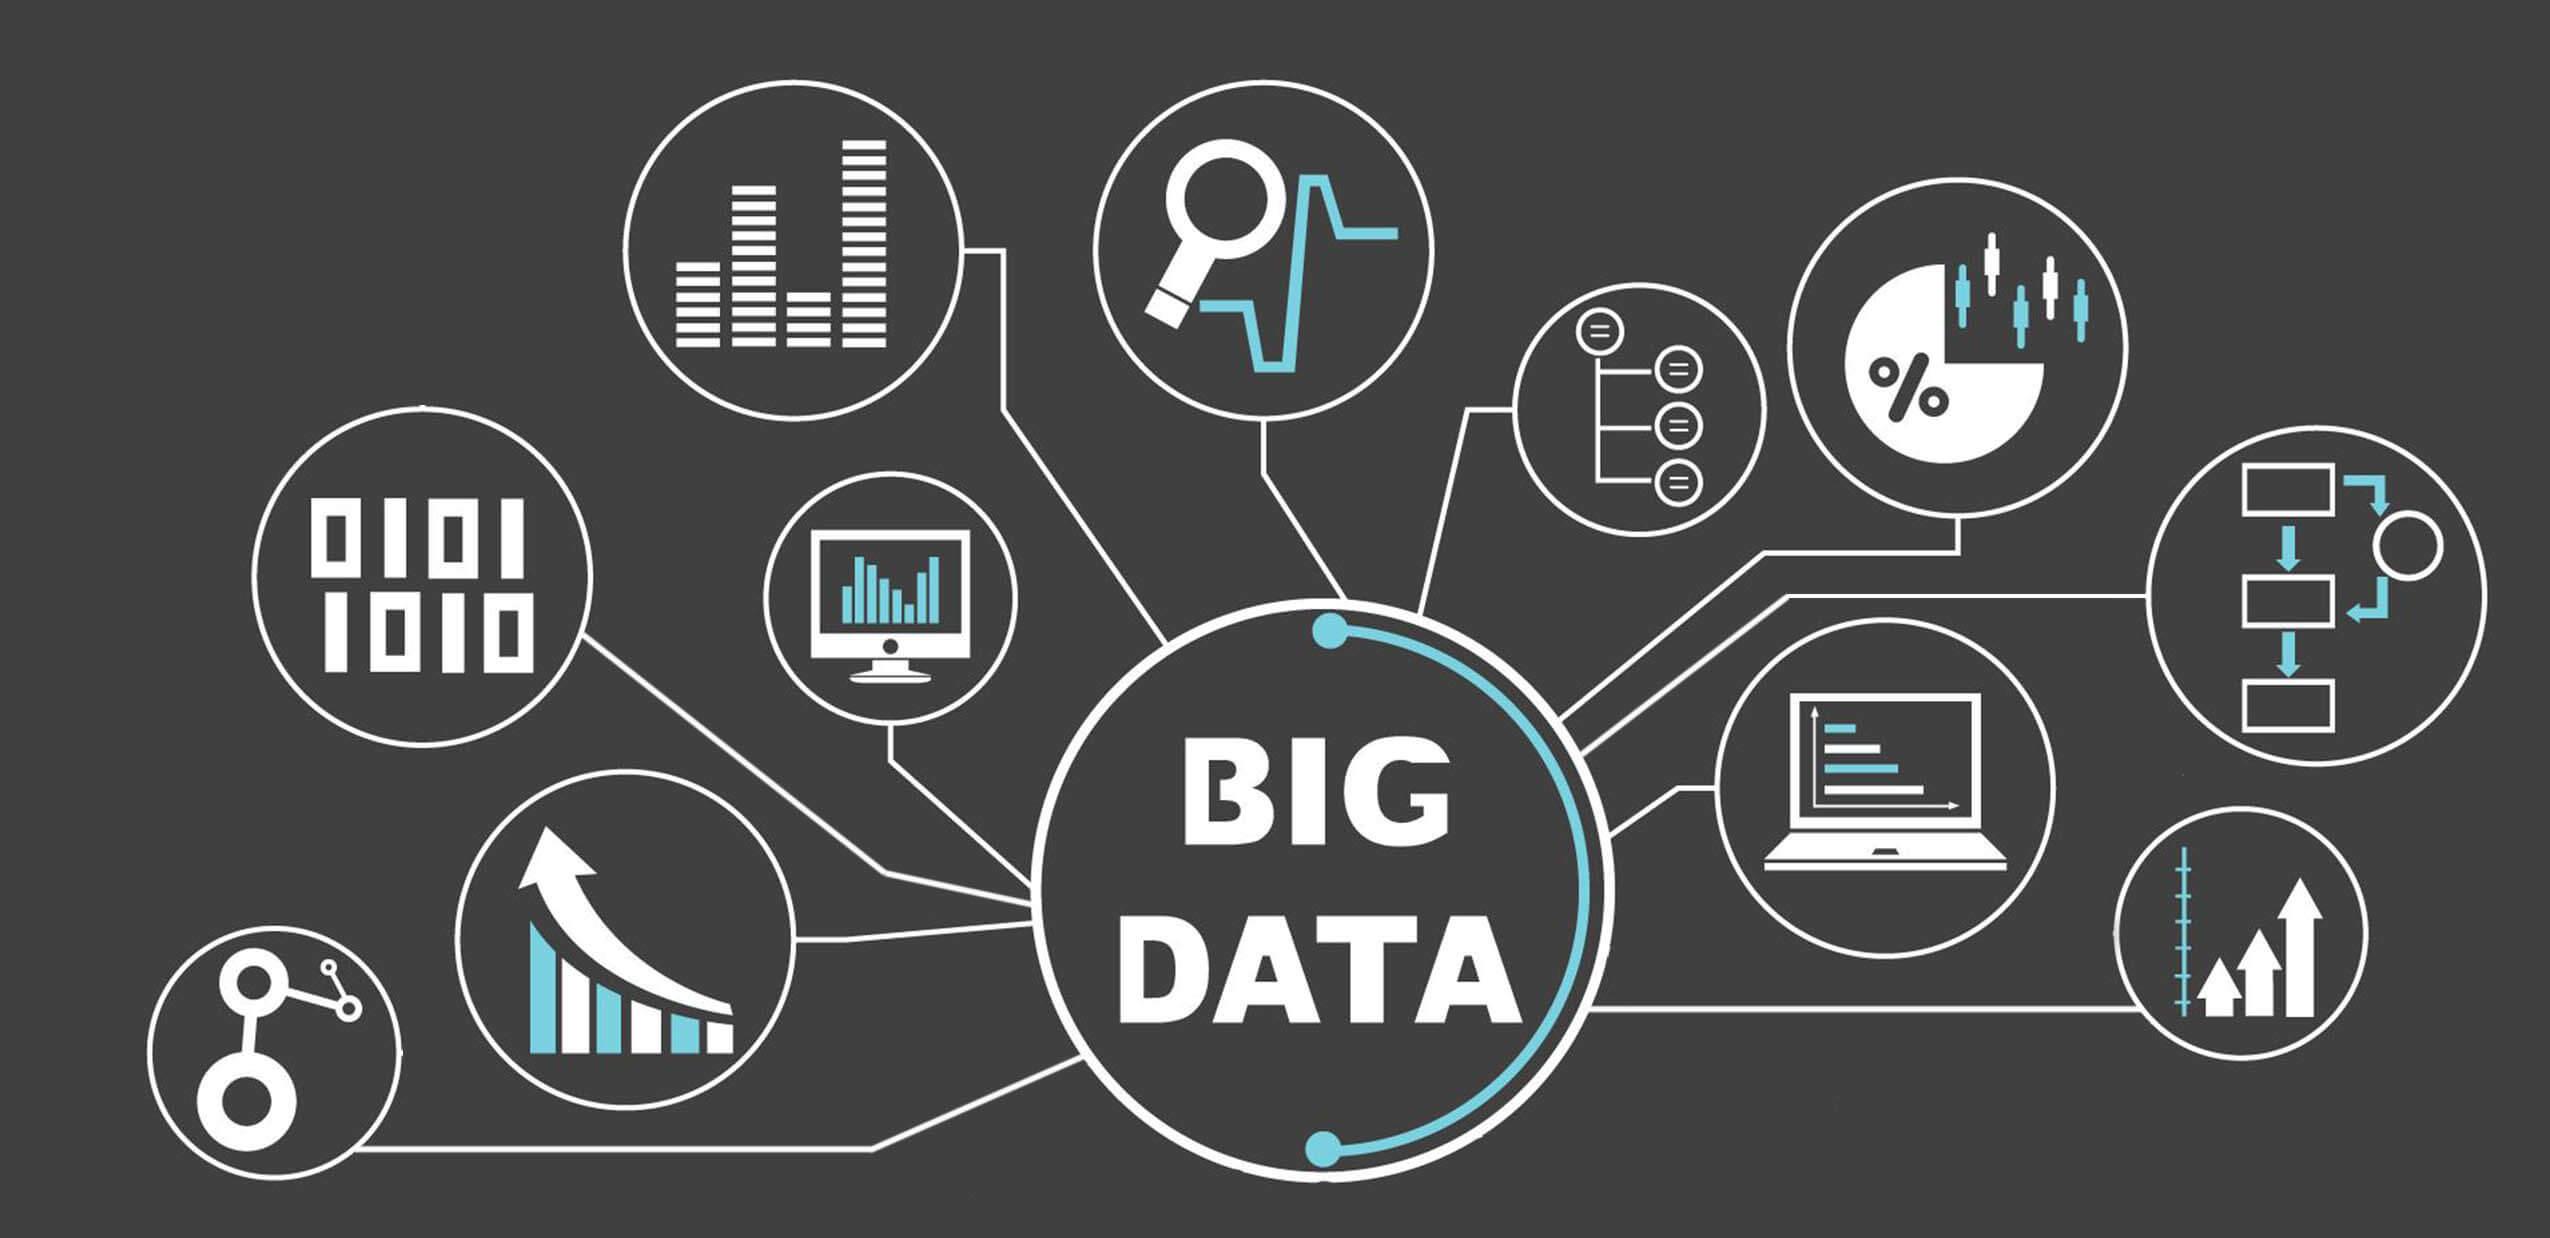 big-data (1).jpg